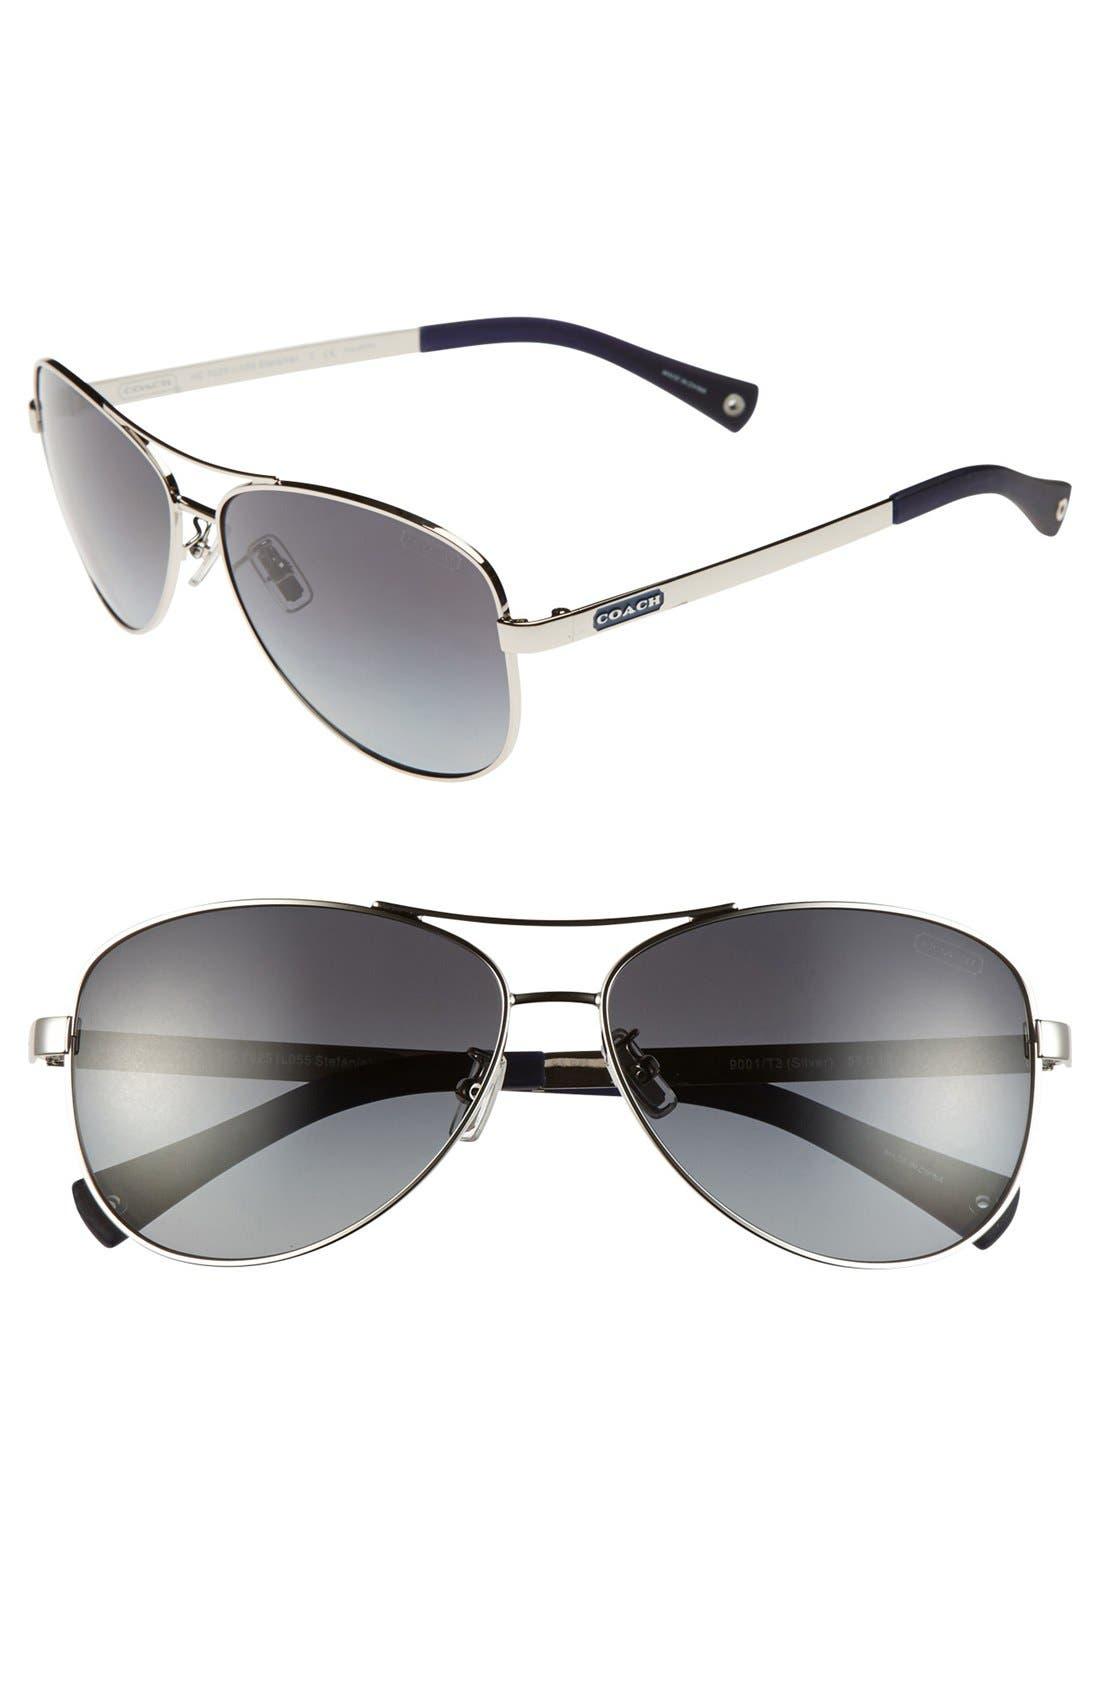 Main Image - COACH 59mm Aviator Sunglasses